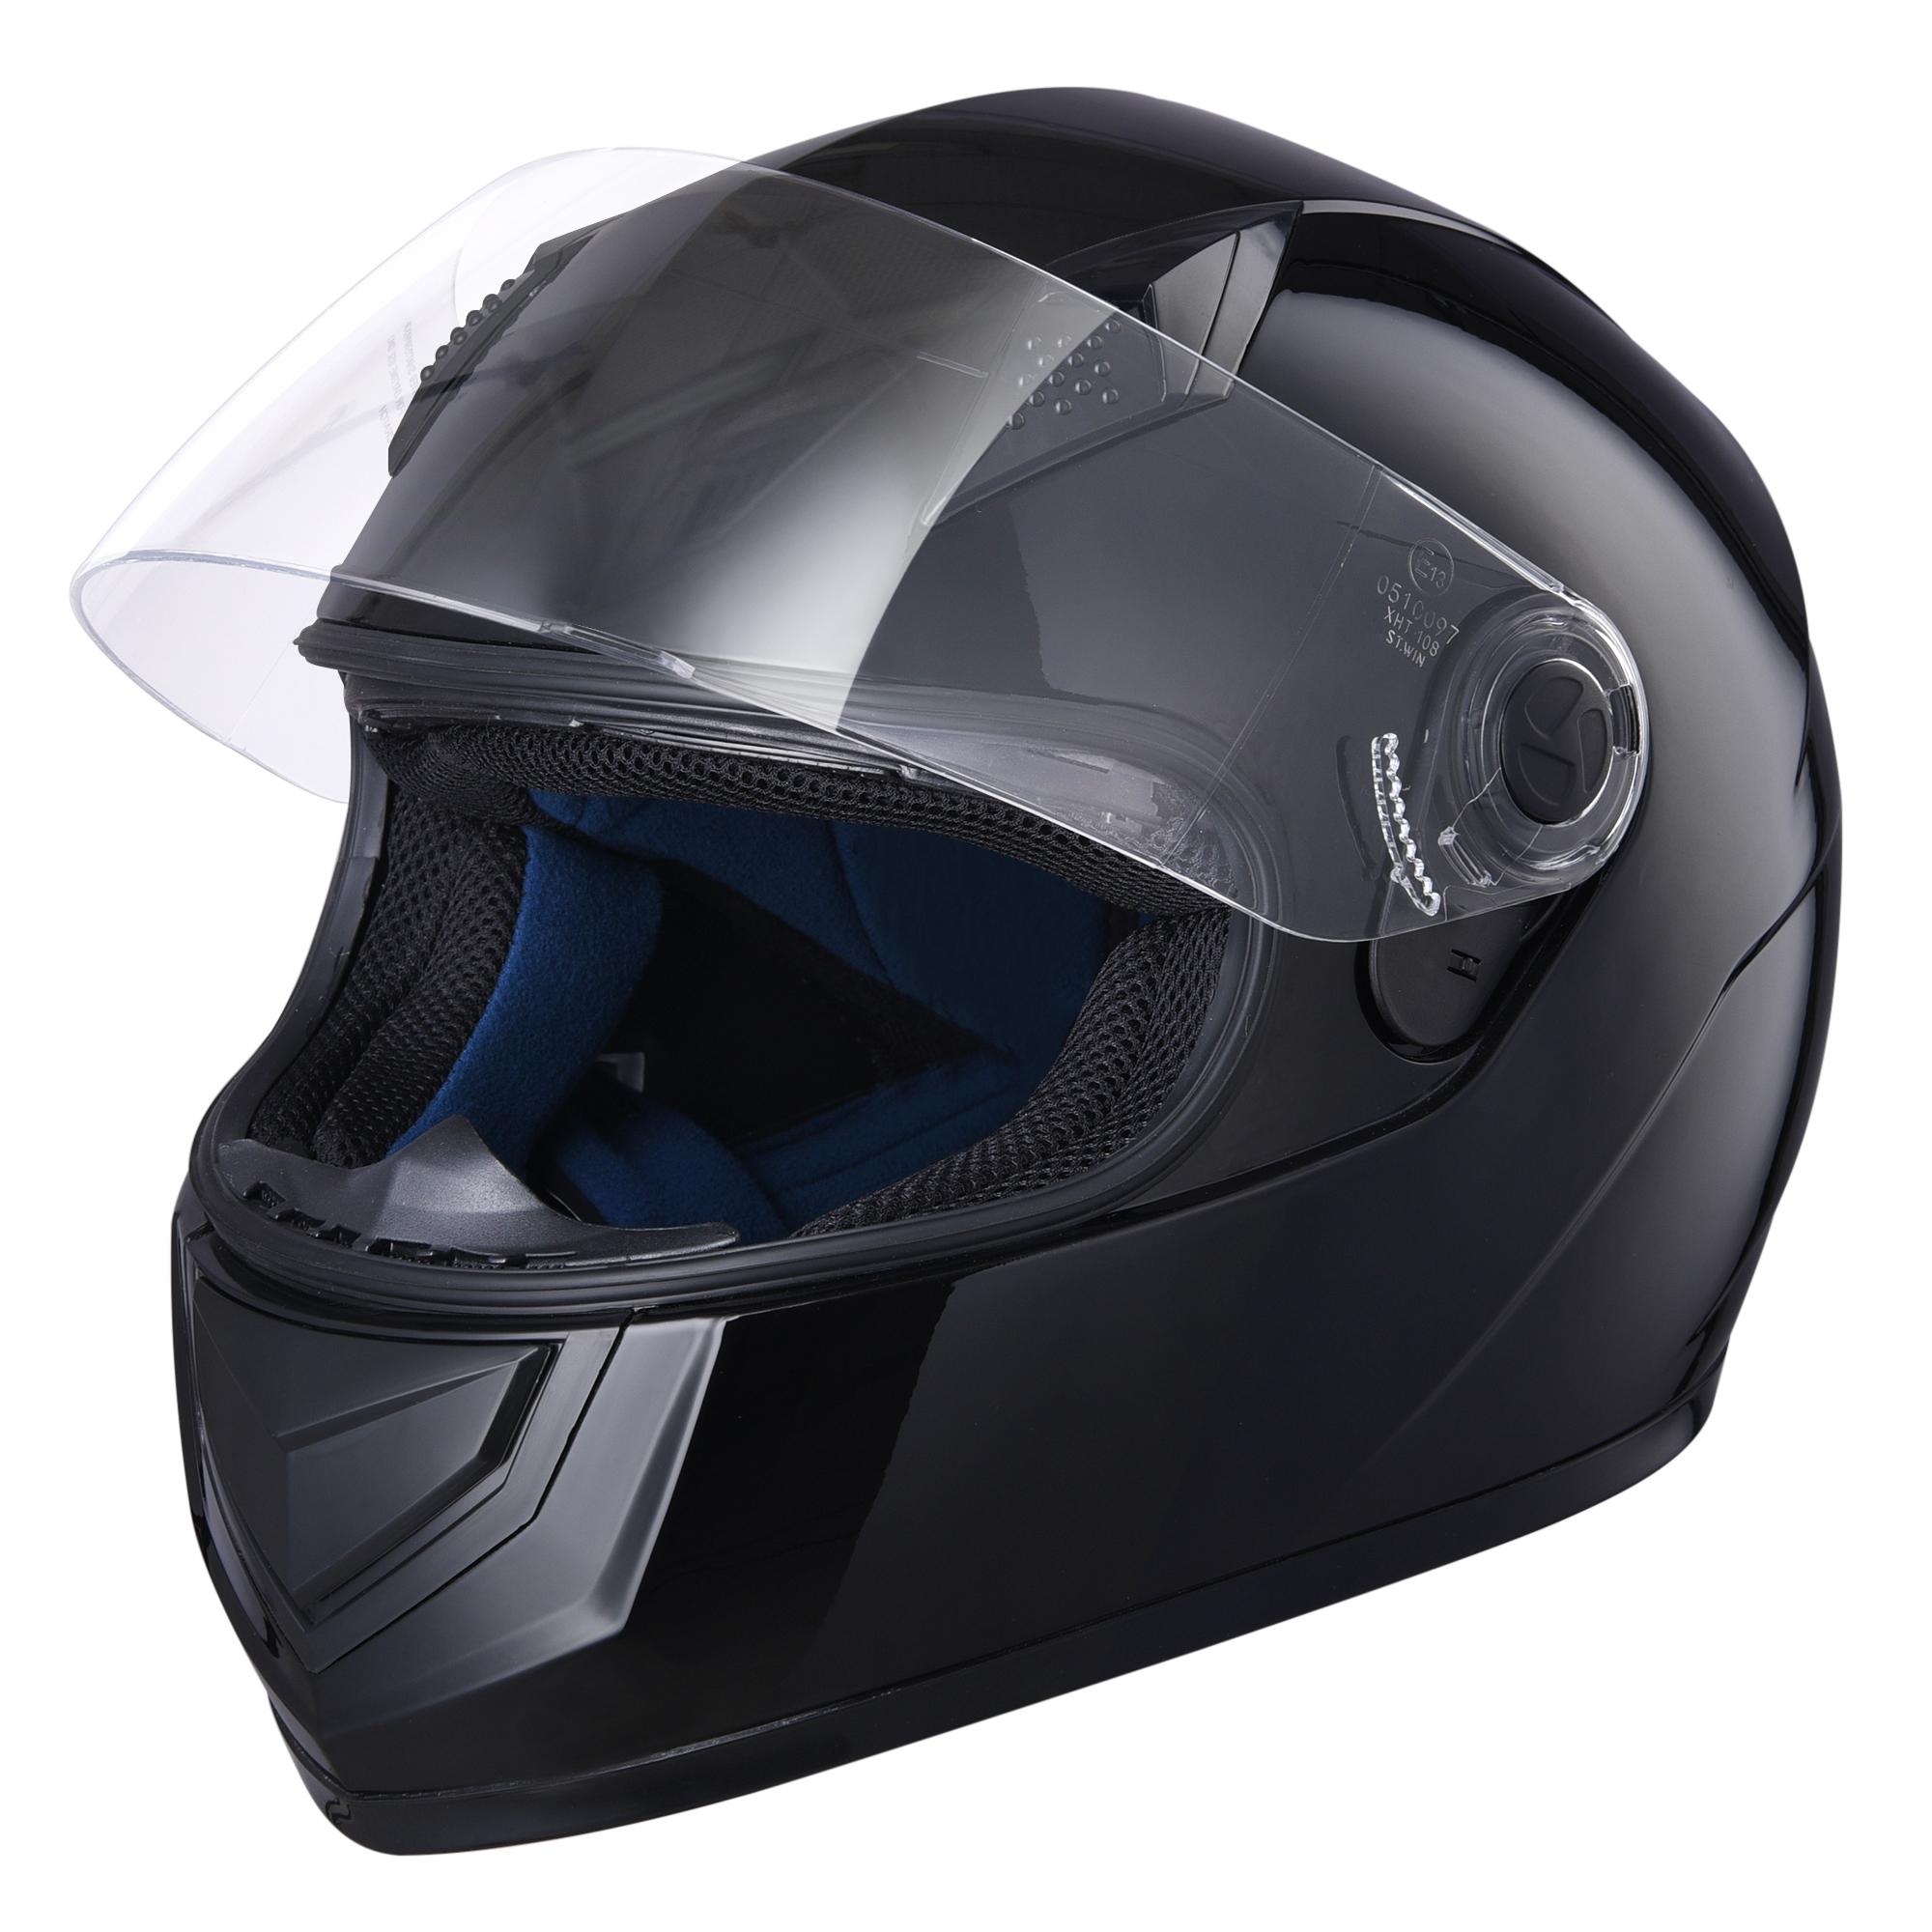 miniature 15 - AHR K12 Full Face Motorcycle Helmet DOT Air Vents Clear Visor Racing S M L XL